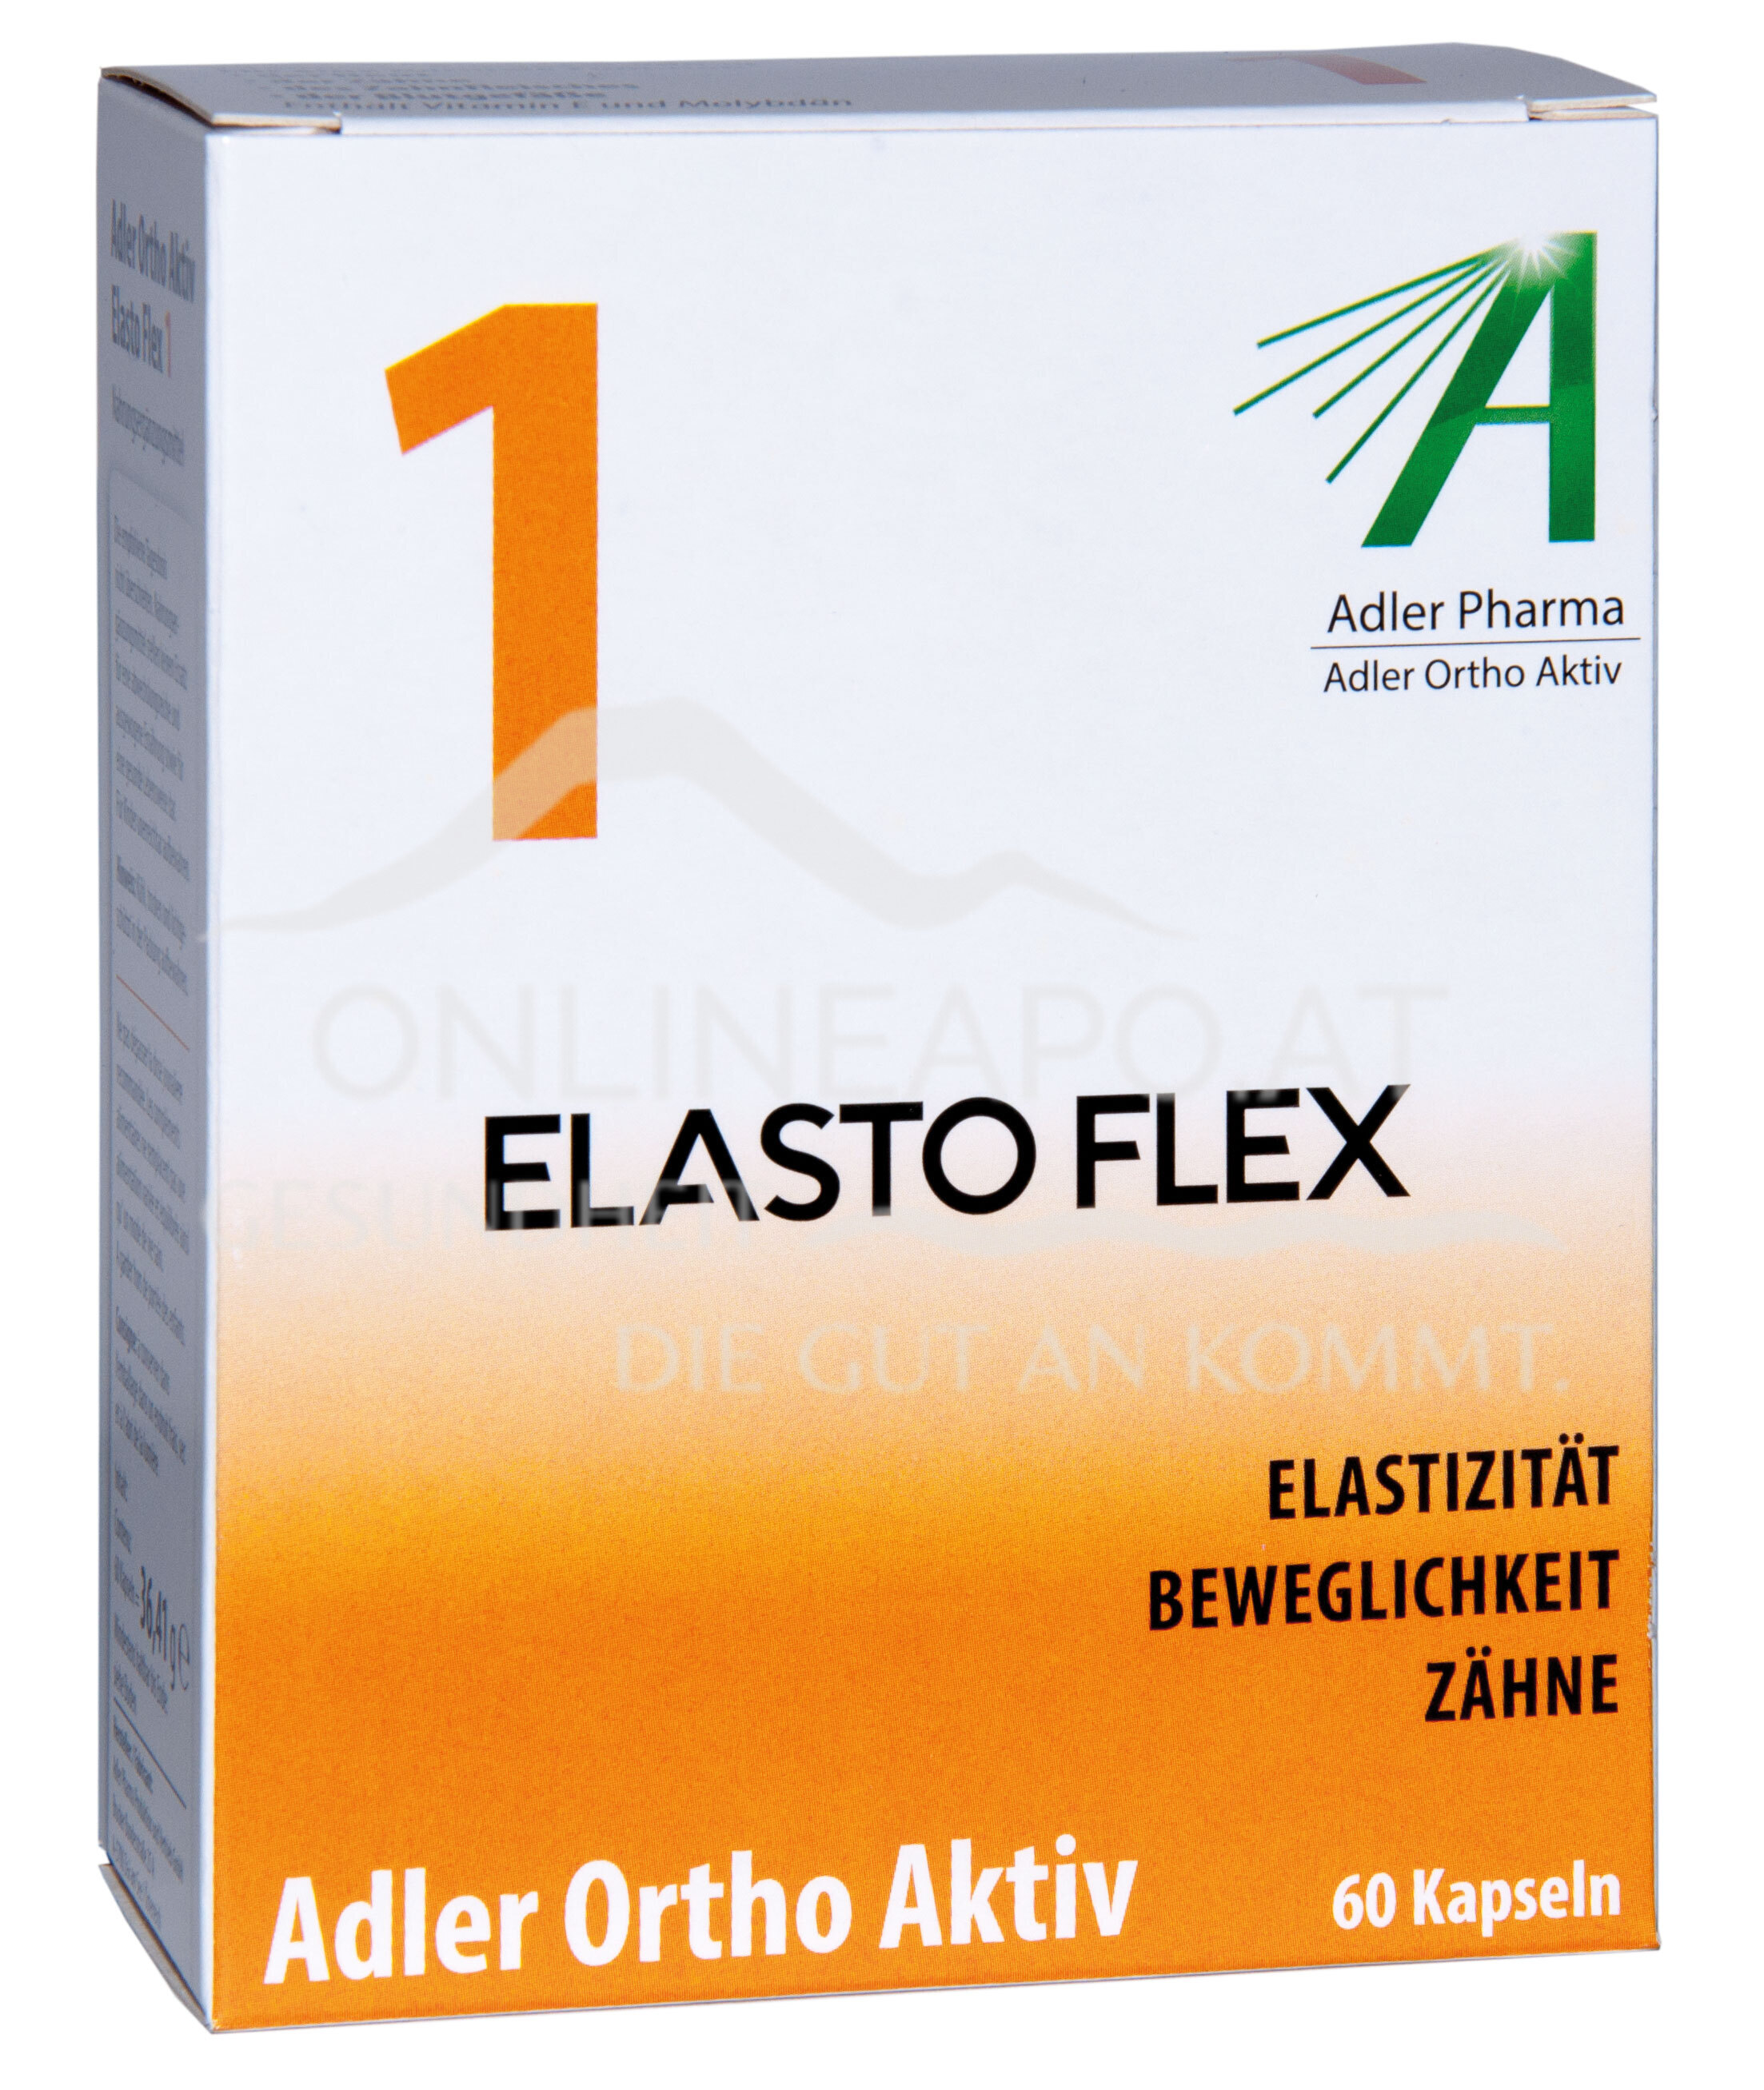 Adler Ortho Aktiv Nr. 1 Elasto Flex